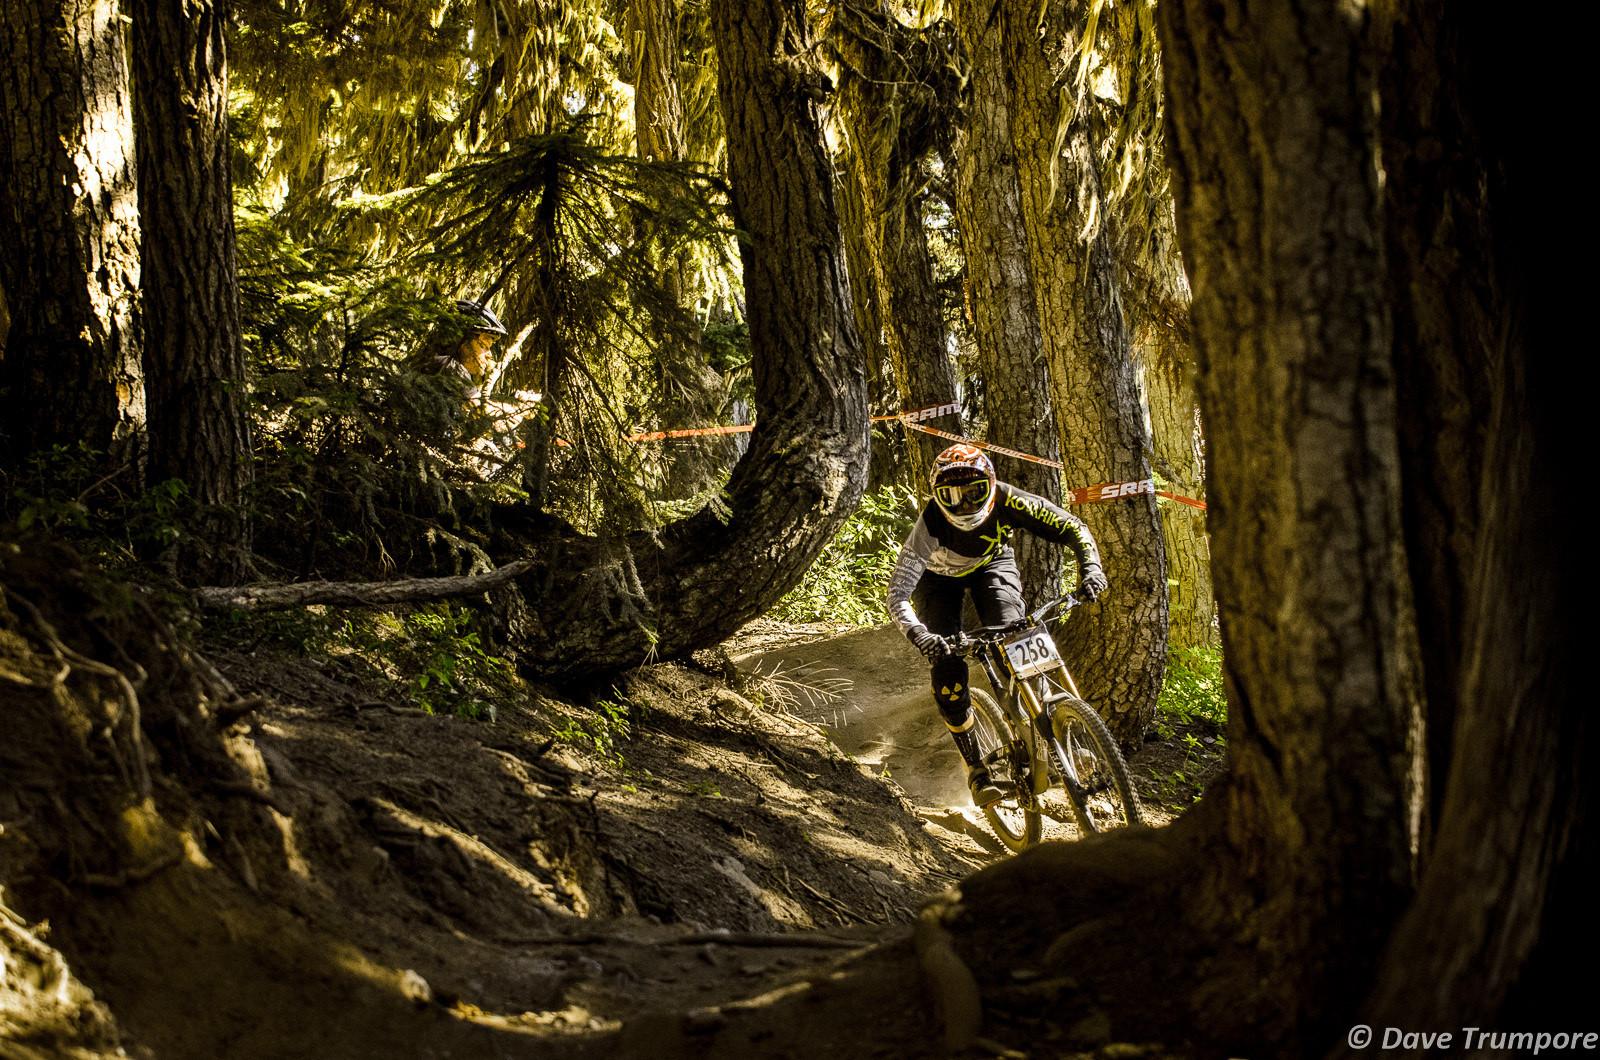 Claire Buchar at Crankworx Garbanzo DH - Crankworx Whistler Garbanzo DH - Mountain Biking Pictures - Vital MTB